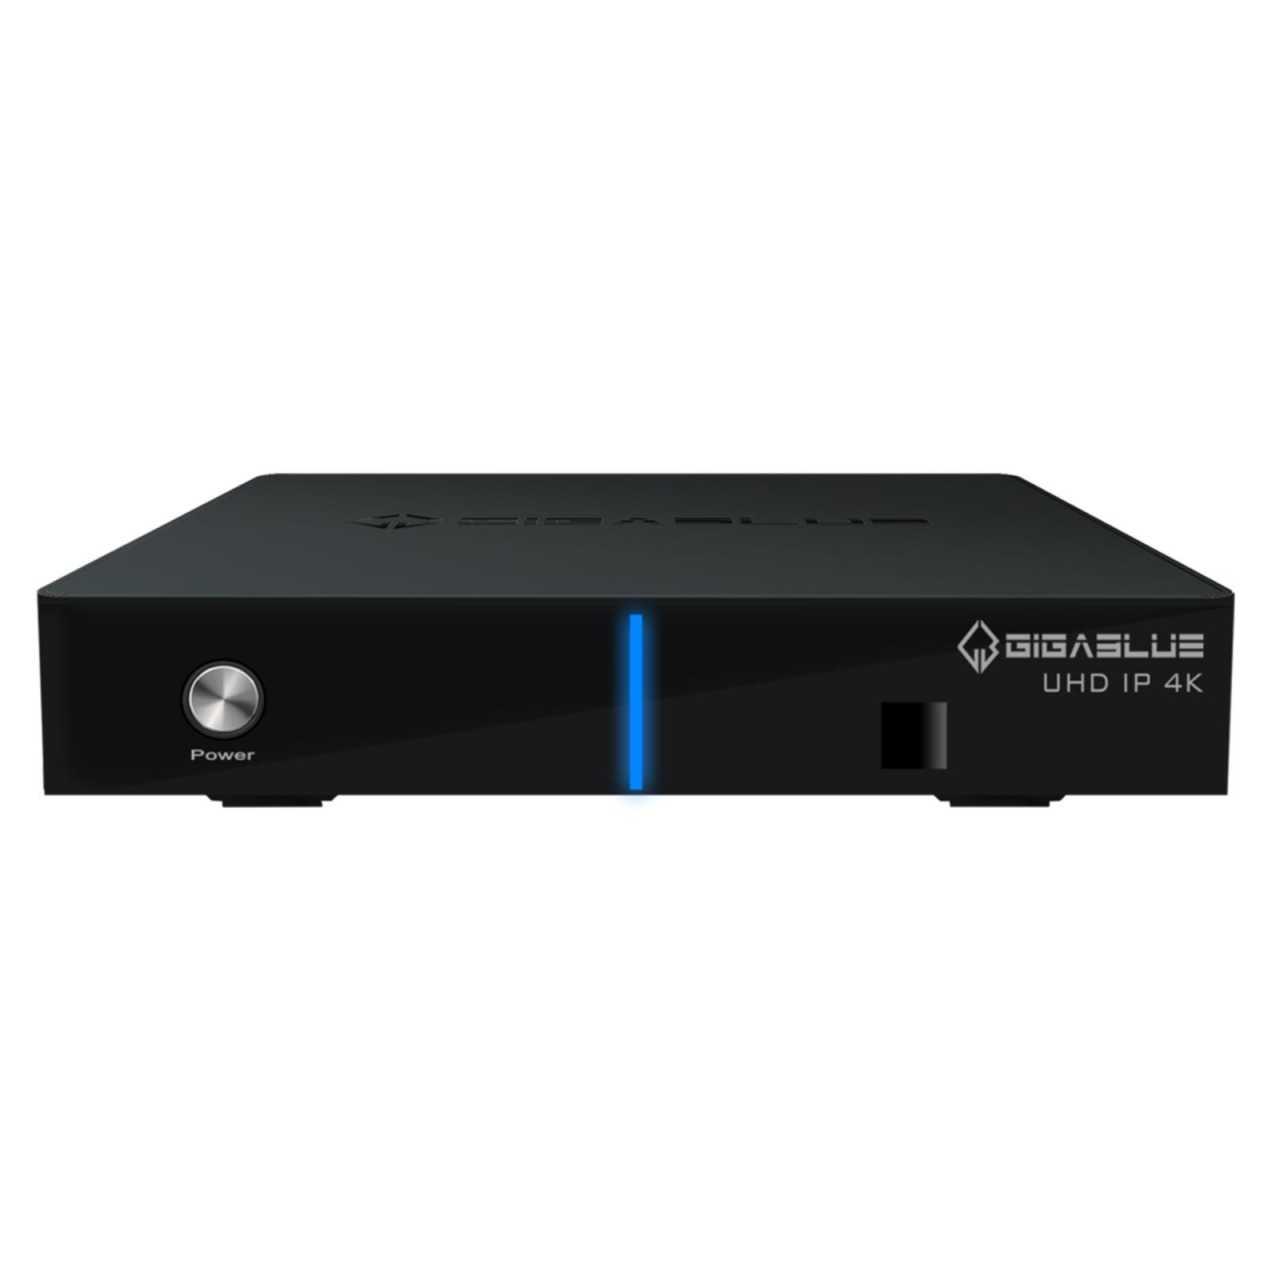 GigaBlue UHD IP 4K USB HDMI SD Karte 1x DVB-S2X Dual Tuner Multiroom Receiver Schwarz RECGIG043